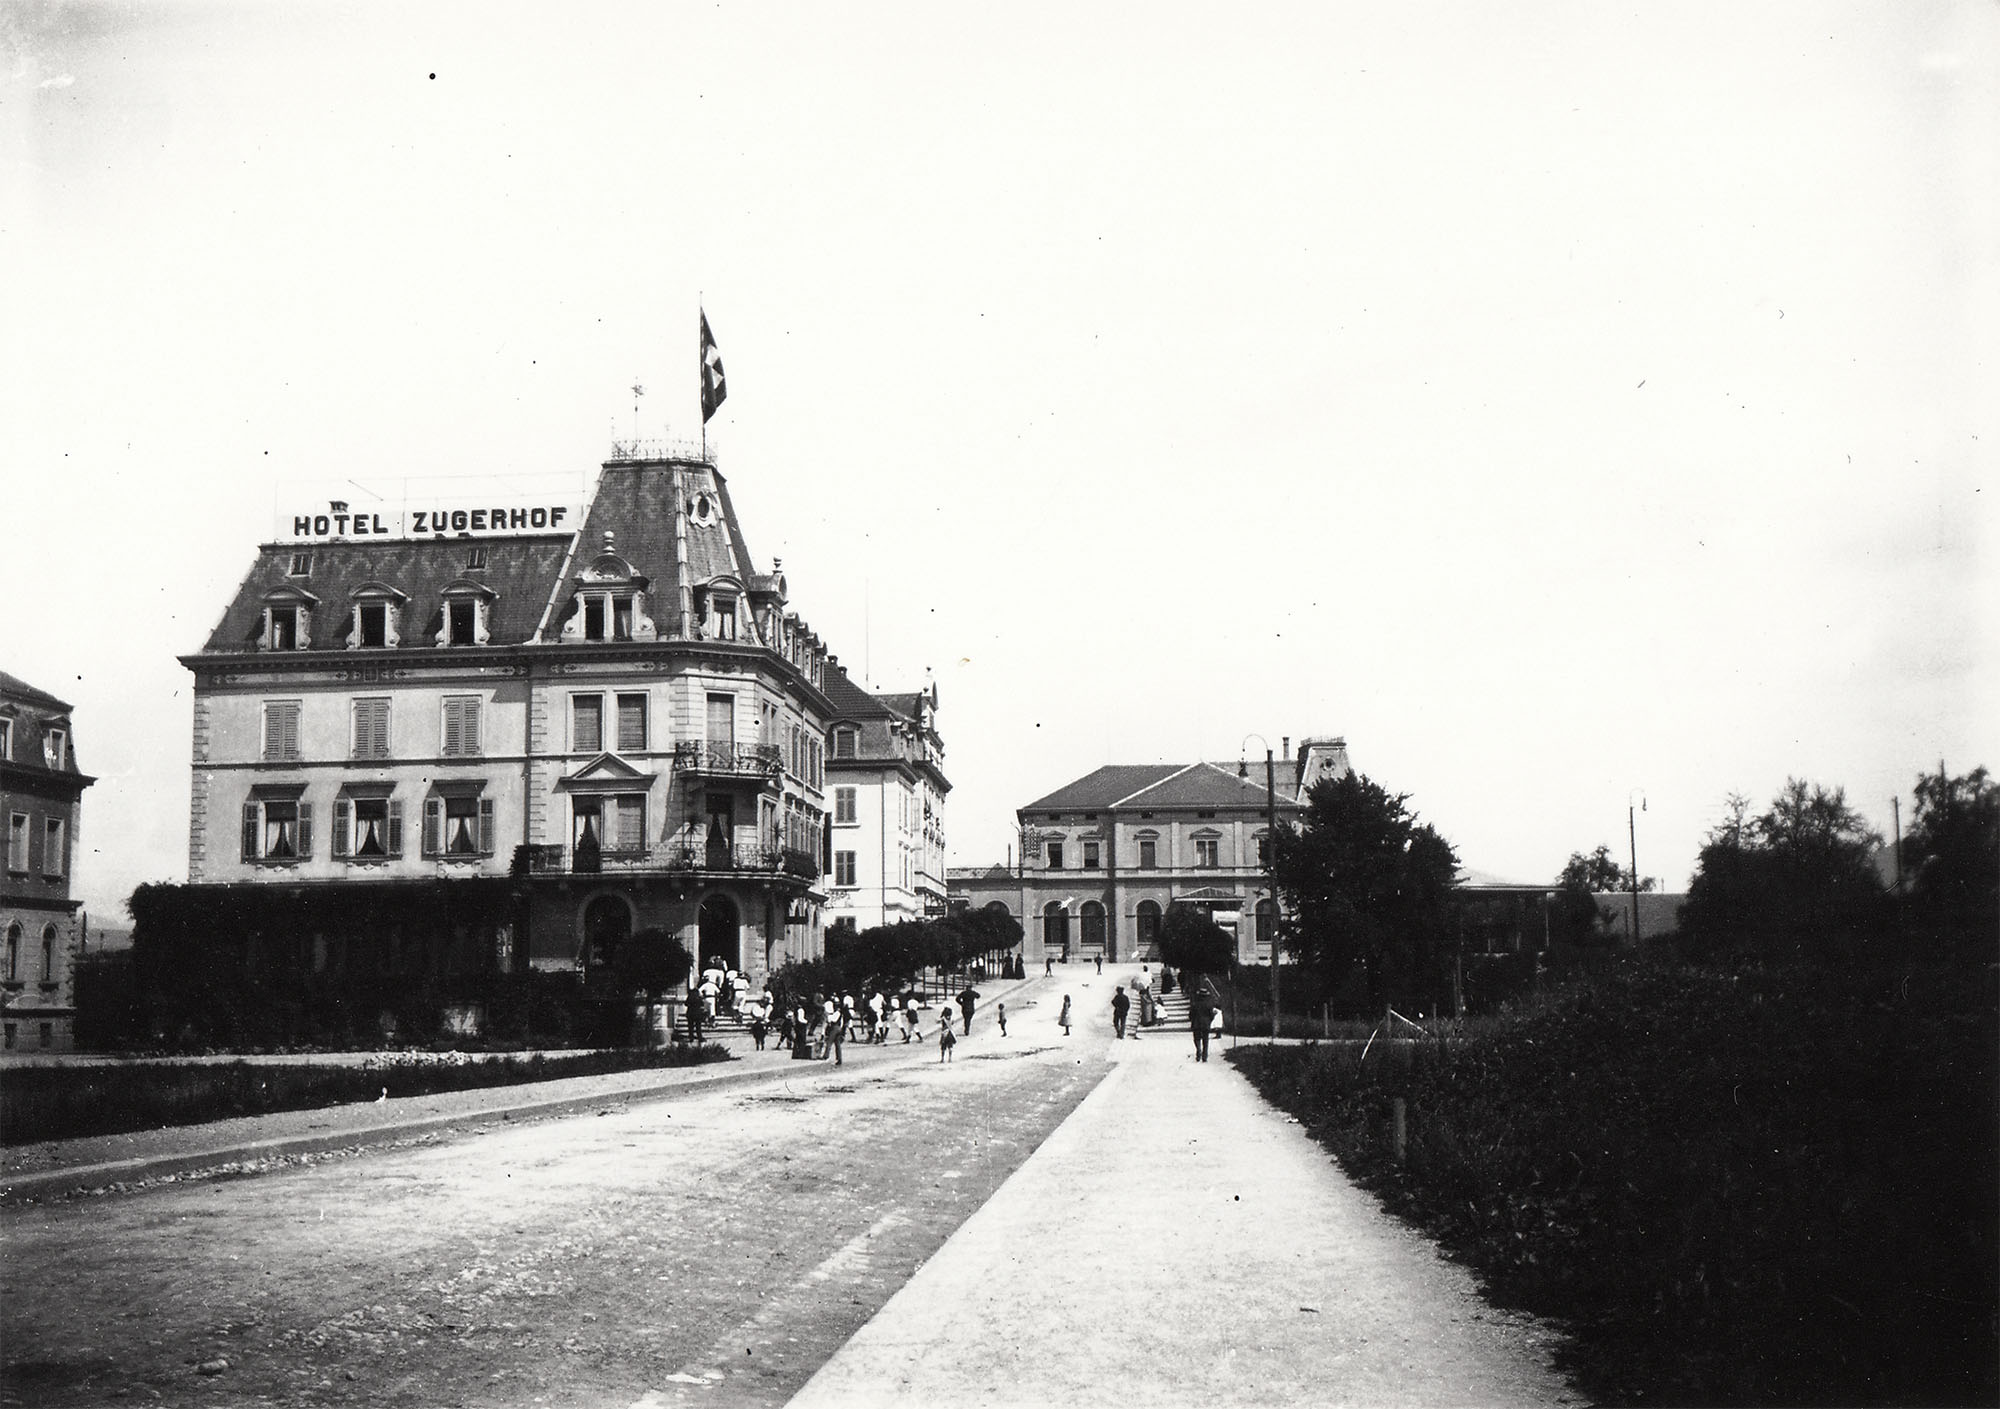 Hotel Zugerhof Zug